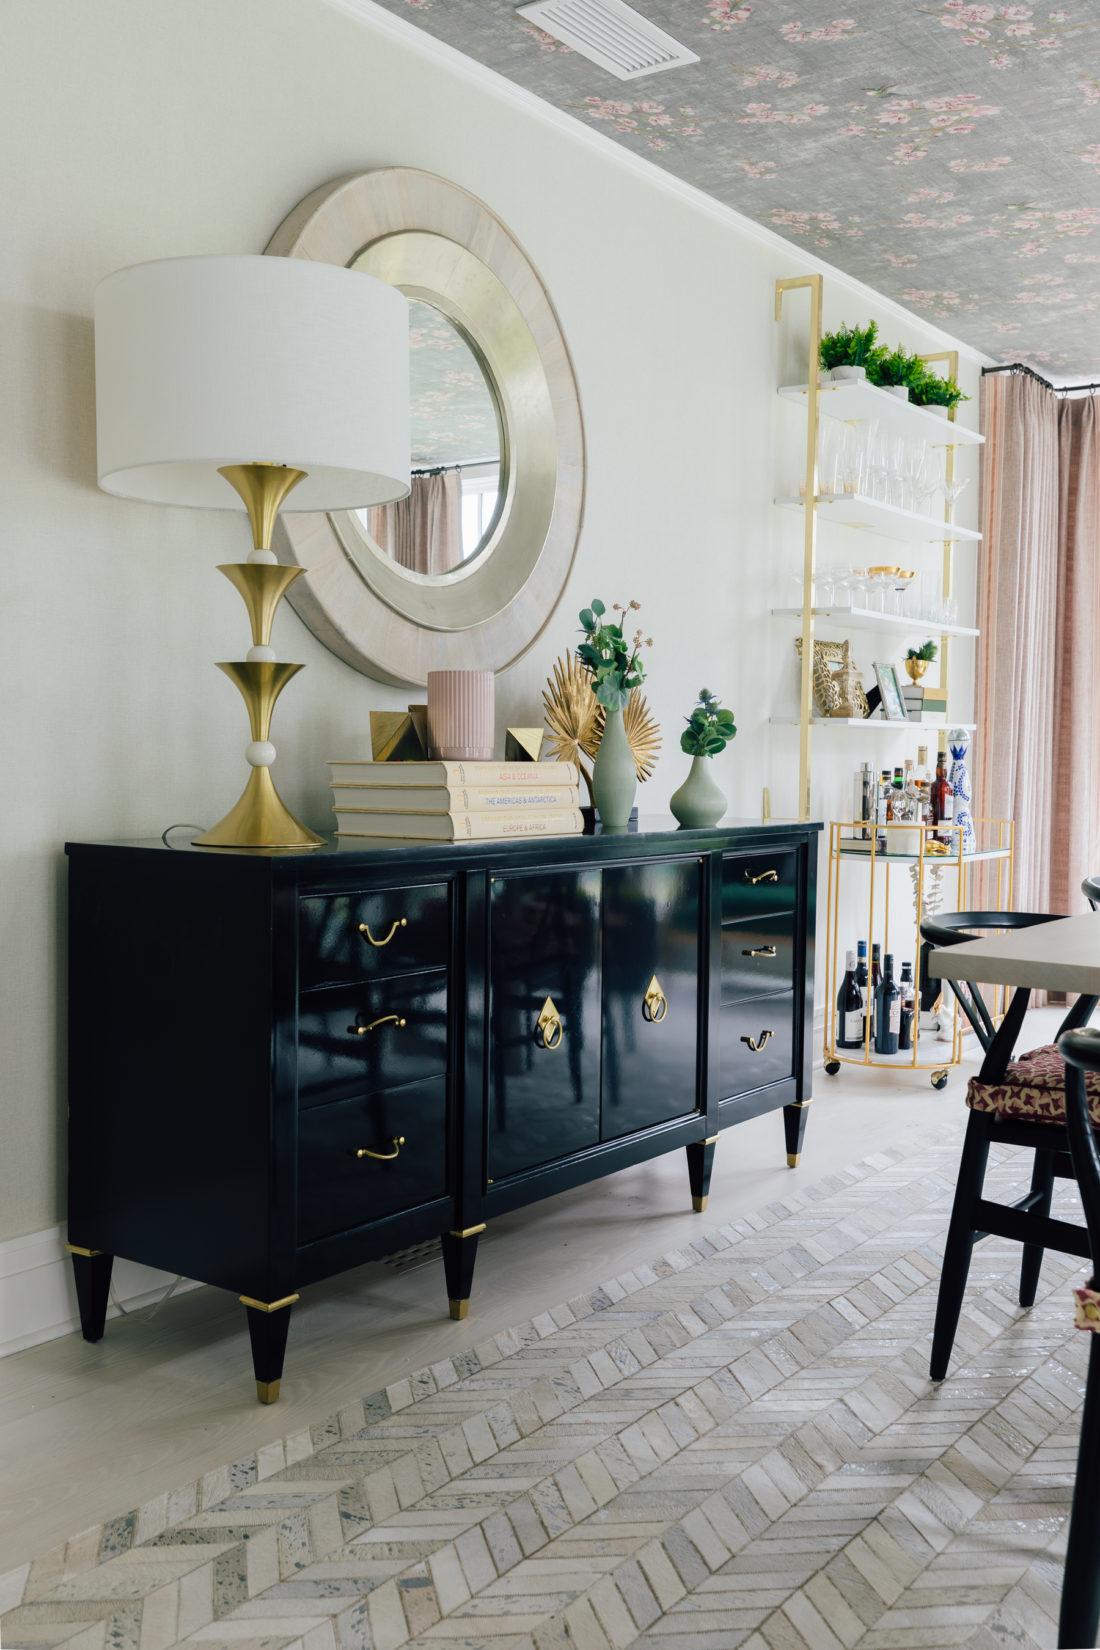 The custom Buffet inside Eva Amurri Martino's renovated dining room